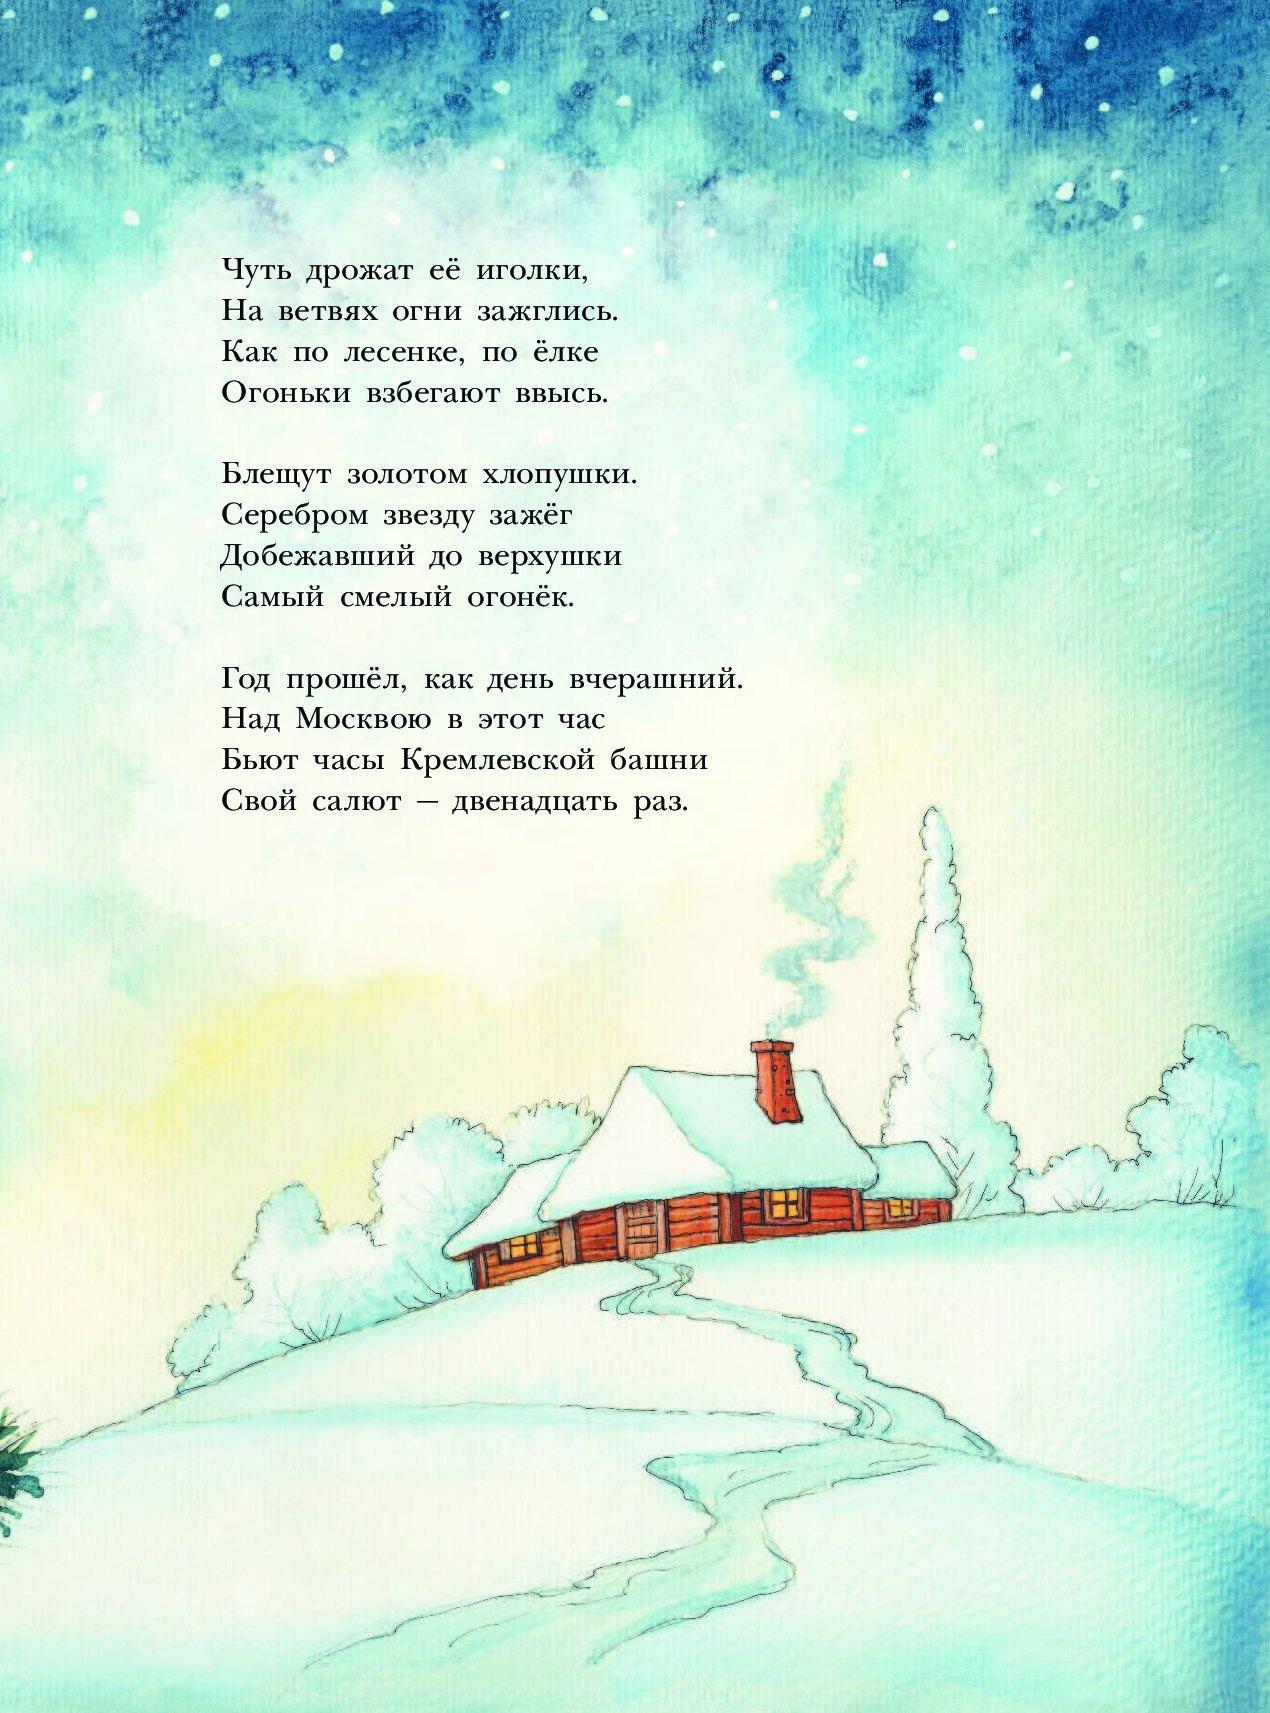 Зимние картинки стихотворение громова вот, когда